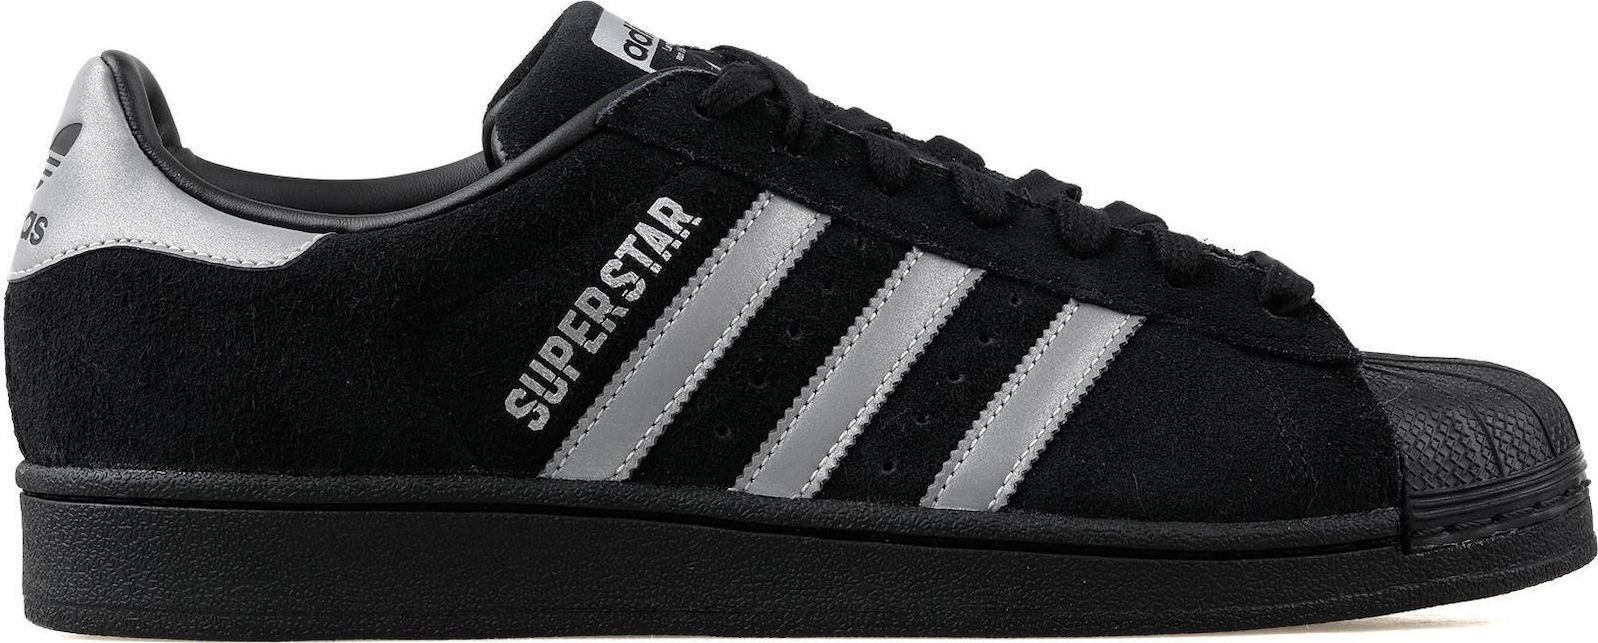 bce59e5dbde Προσθήκη στα αγαπημένα menu Adidas Superstar